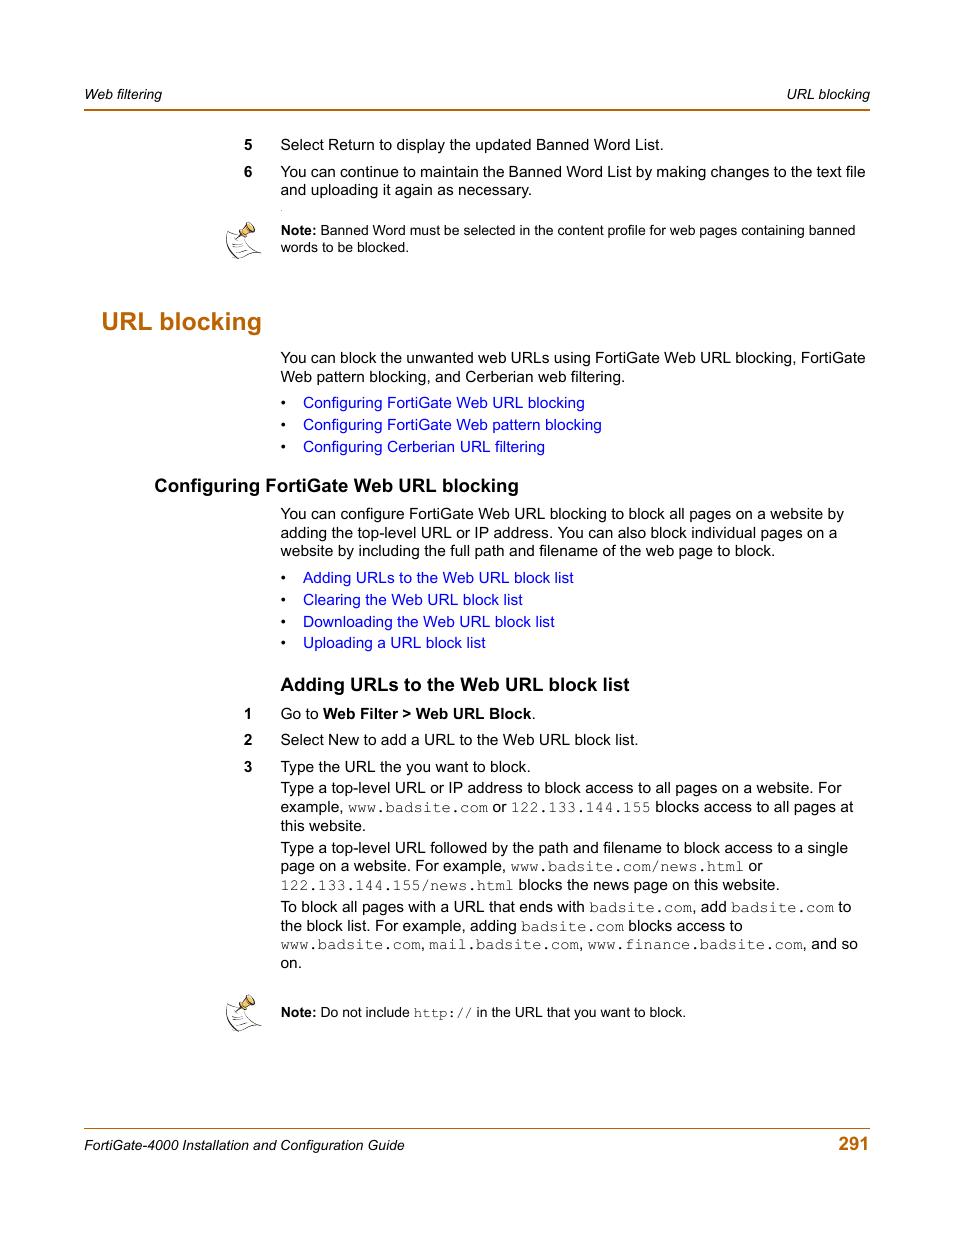 Url blocking configuring fortigate web url blocking adding urls to url blocking configuring fortigate web url blocking adding urls to the web url block list fortinet fortigate 4000 user manual page 291 332 ccuart Images